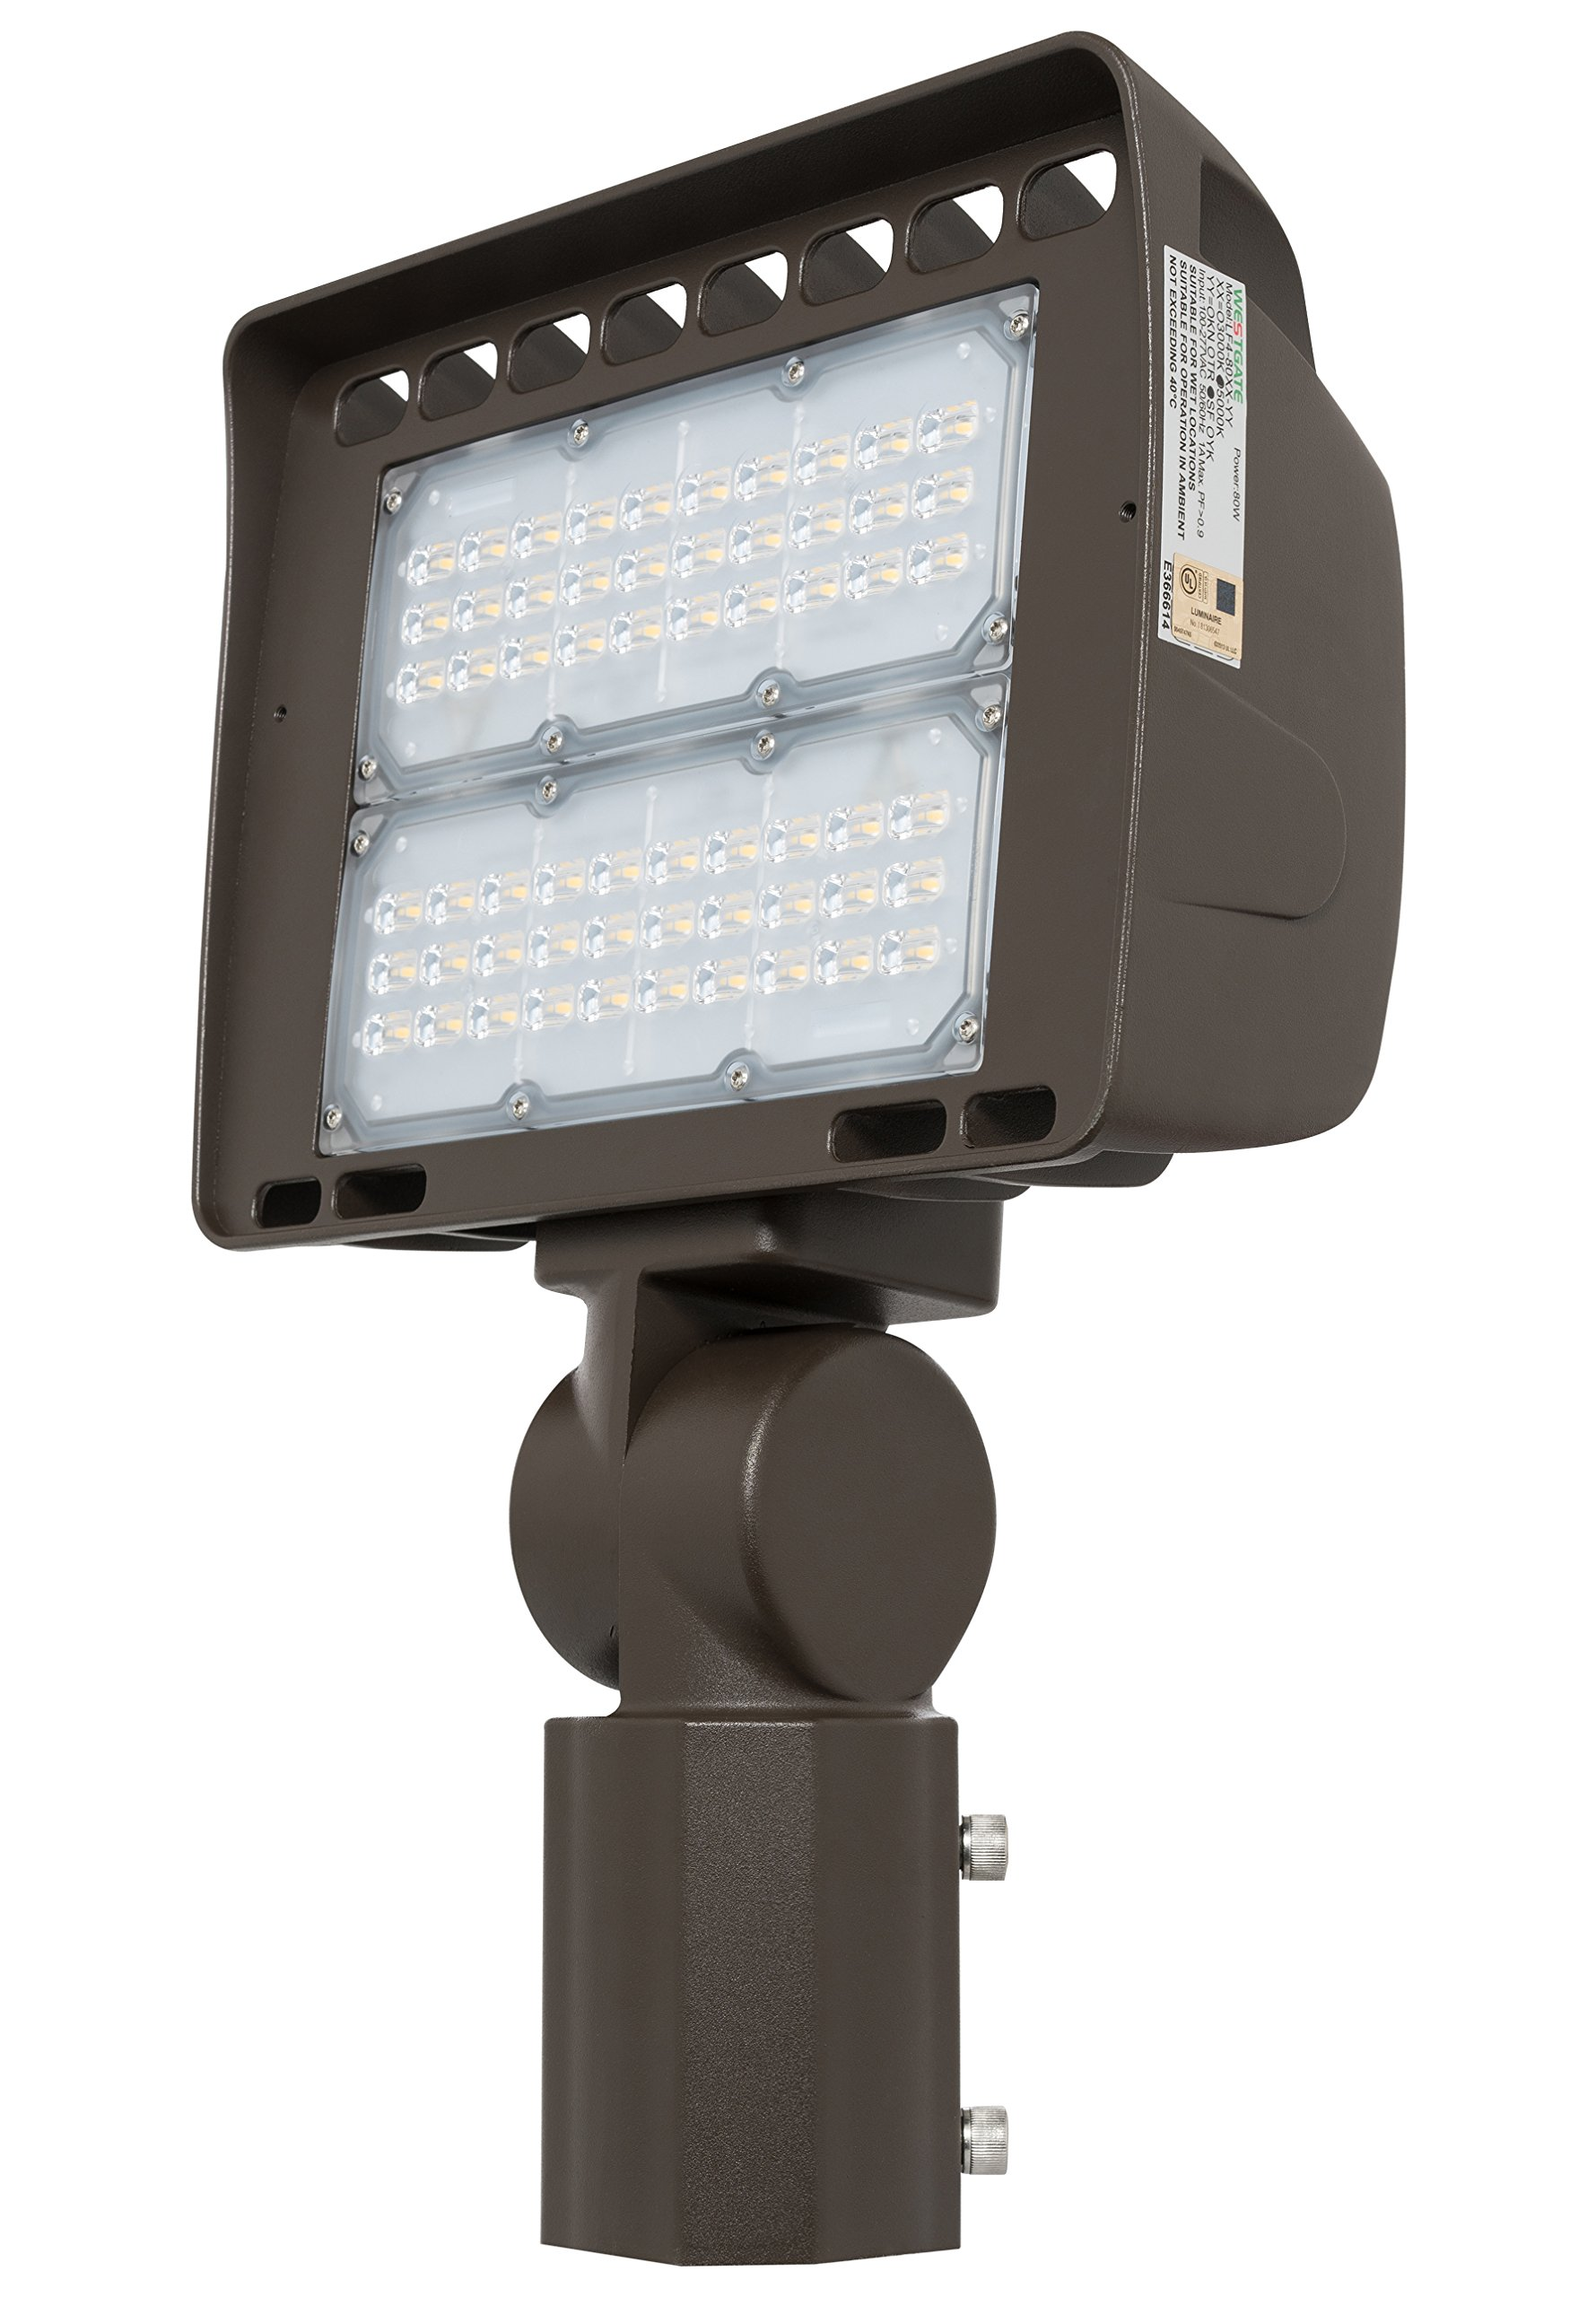 Westgate Lighting Outdoor LED Flood Light Fixture Slip Fitter Mount - Shoebox Street Area Parking Pole Security Floodlights - 120-277V - IP65 Waterproof UL Listed (100 Watt, 5000K Cool White) by Westgate